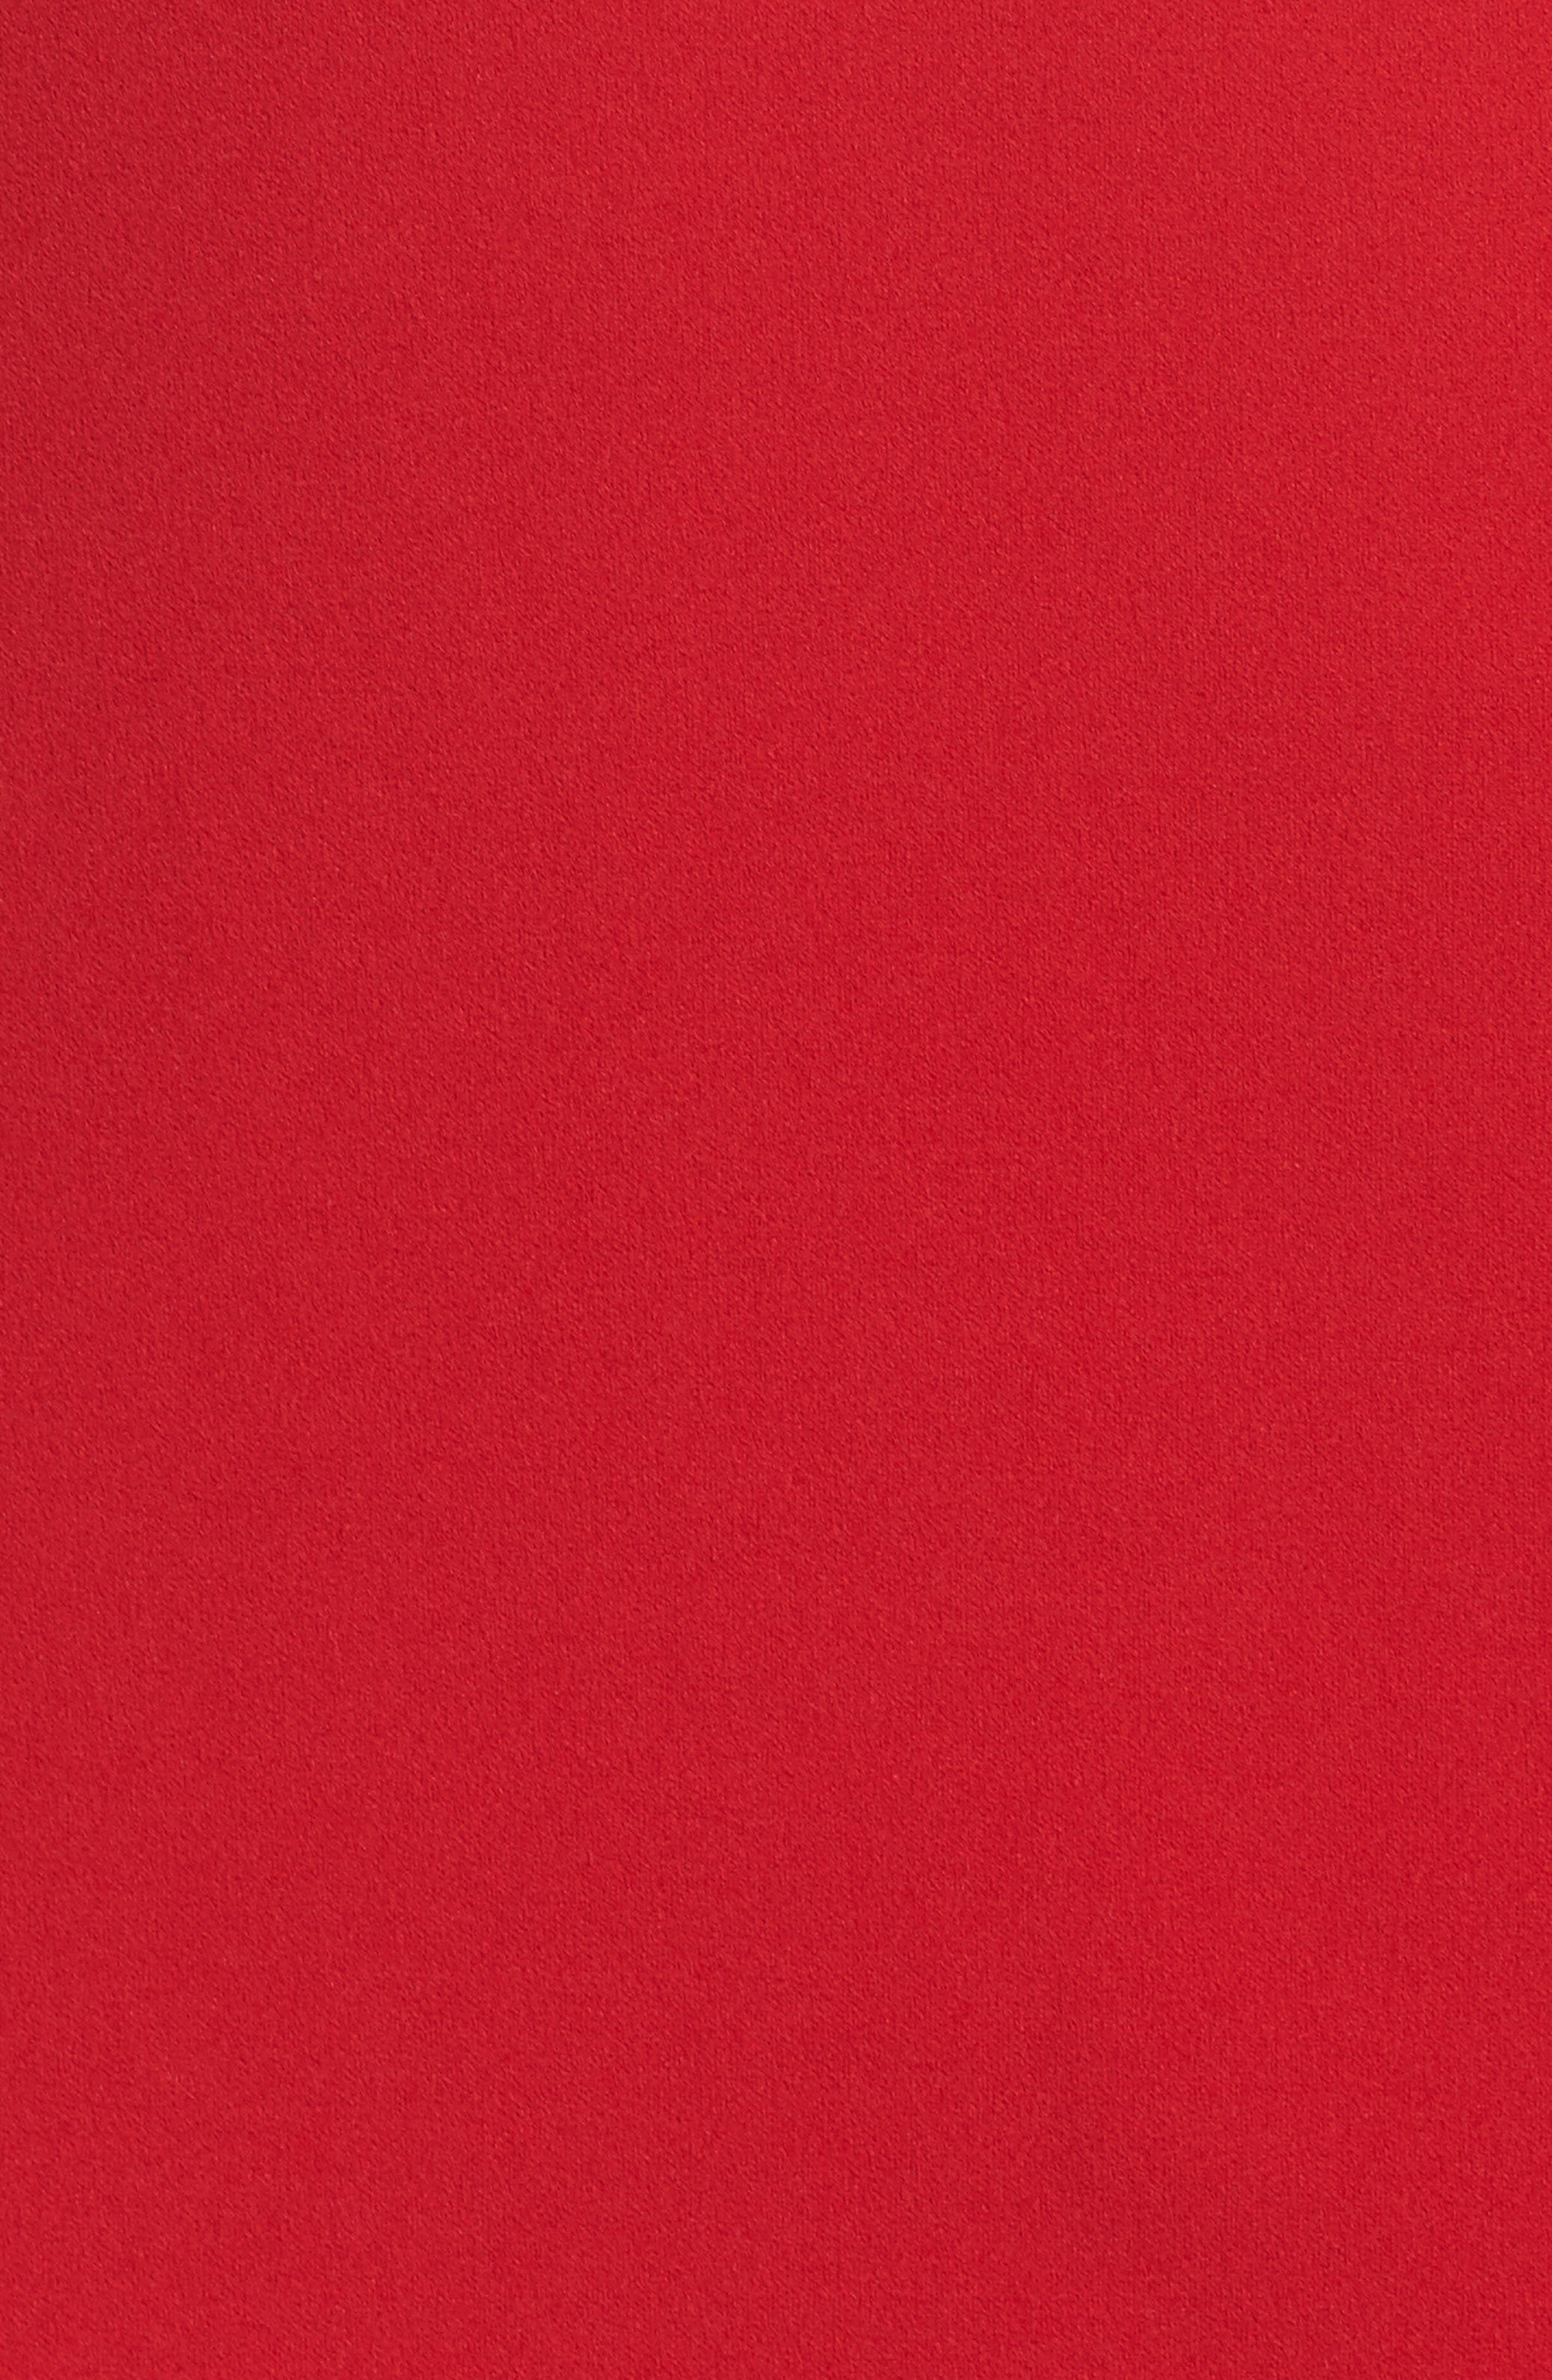 Ruffle One-Shoulder Scuba Body-Con Dress,                             Alternate thumbnail 5, color,                             Red